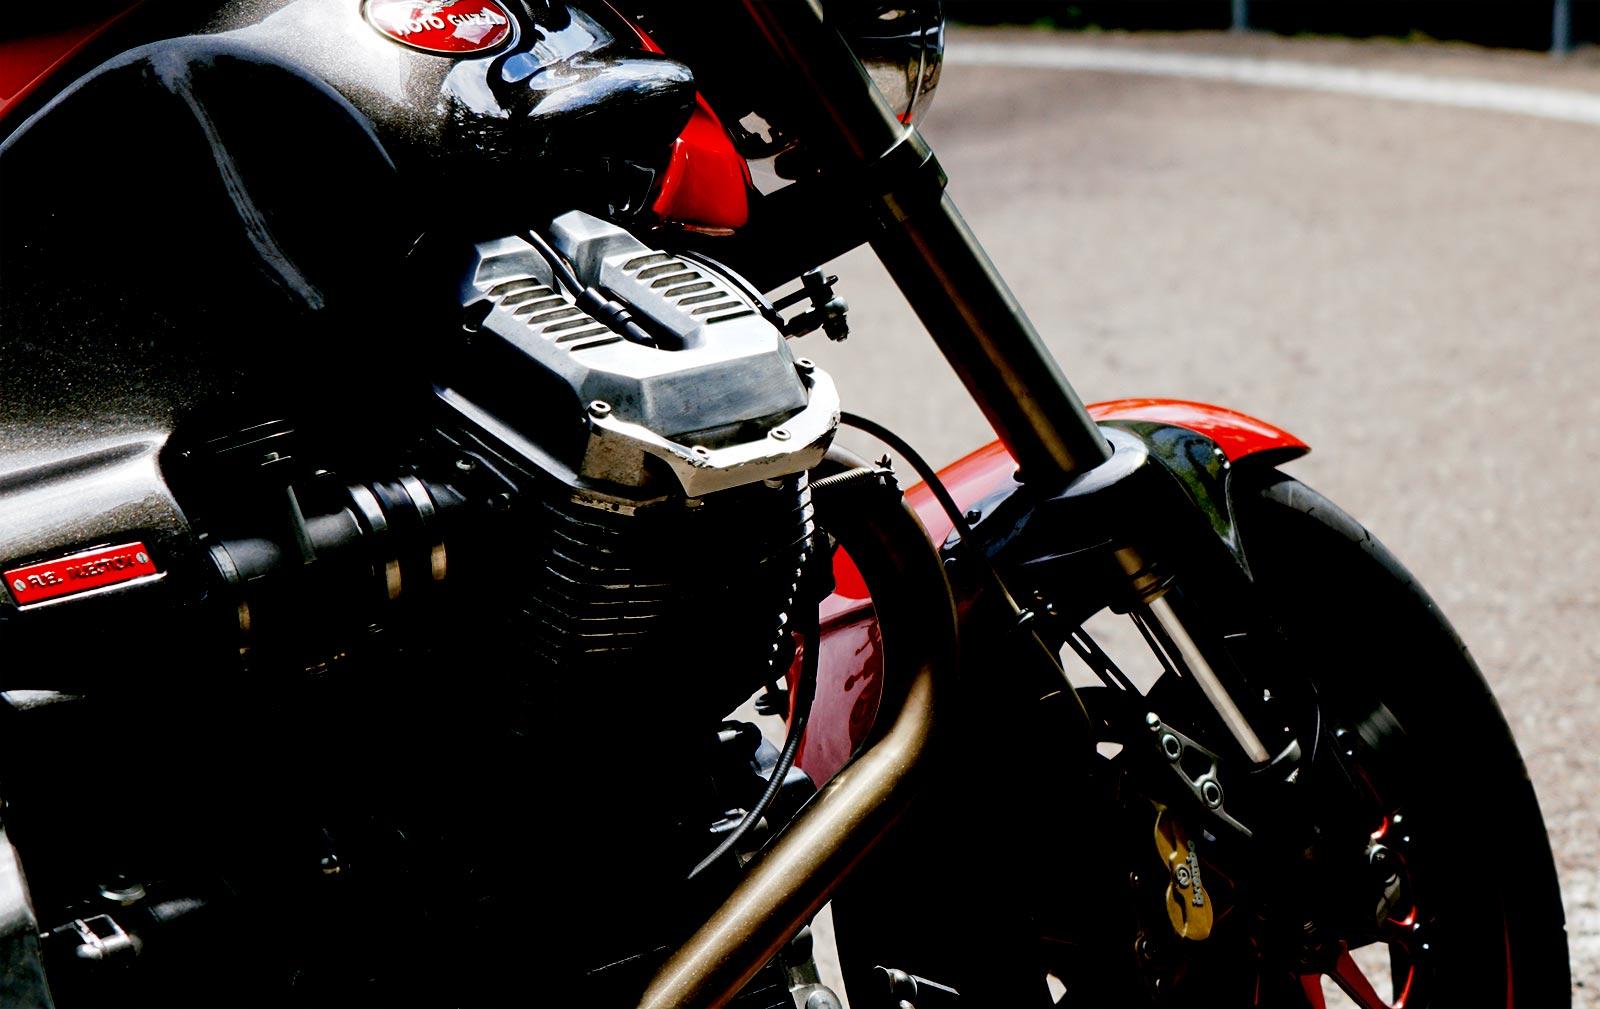 Joyside Moto Guzzi Centauro